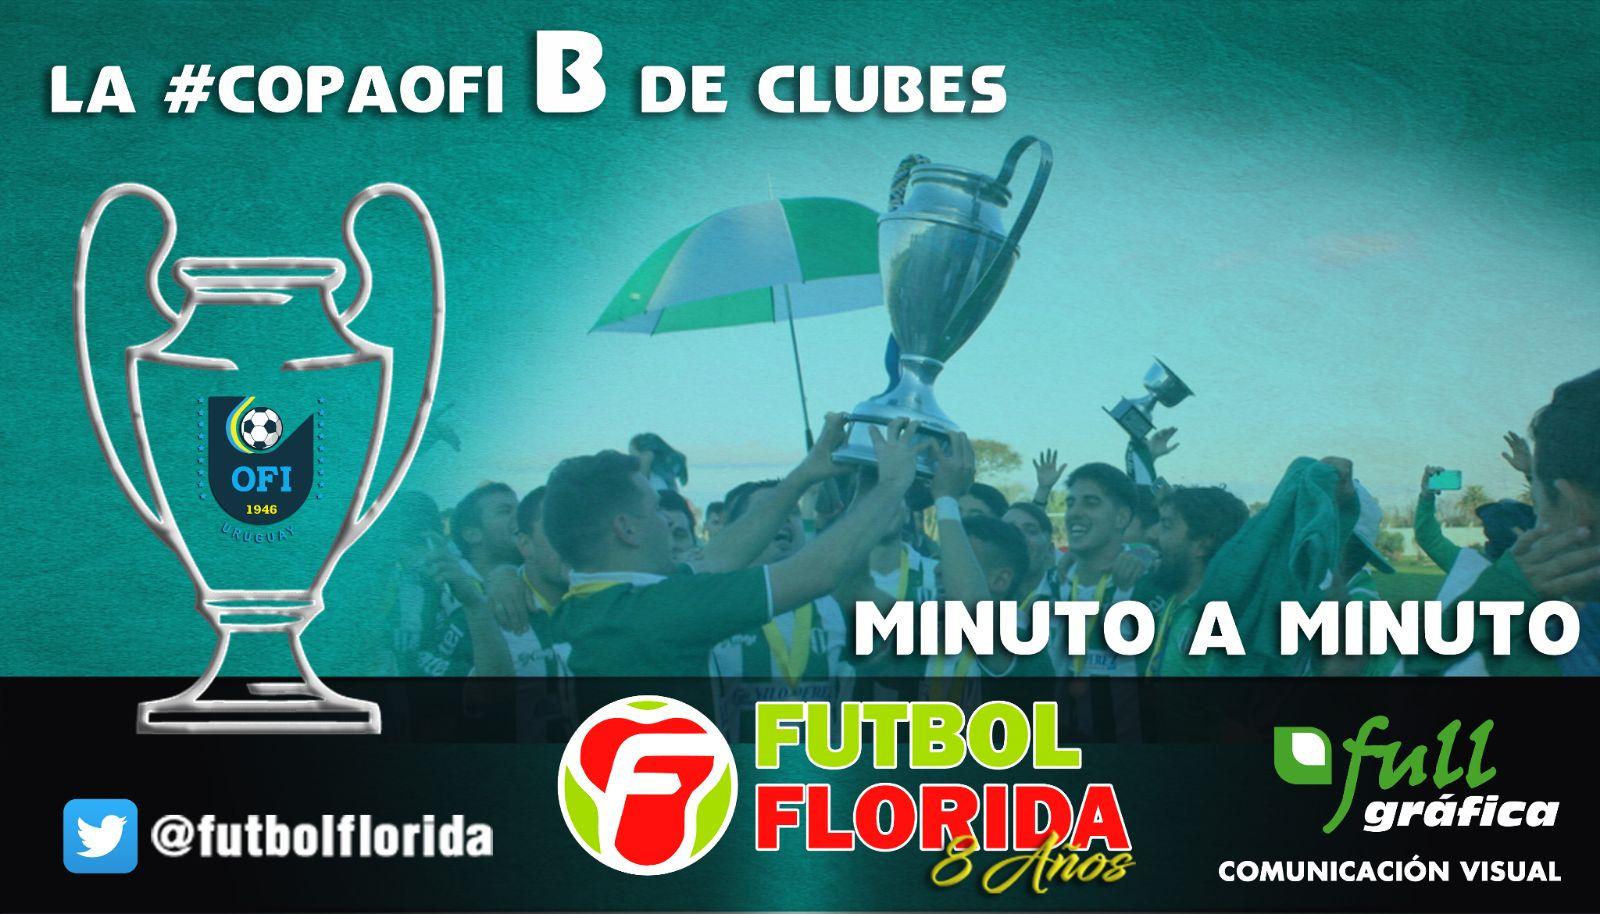 #COPAOFI . Árbitros y detalles de la 2da fecha de la 2da Fase de Copa B